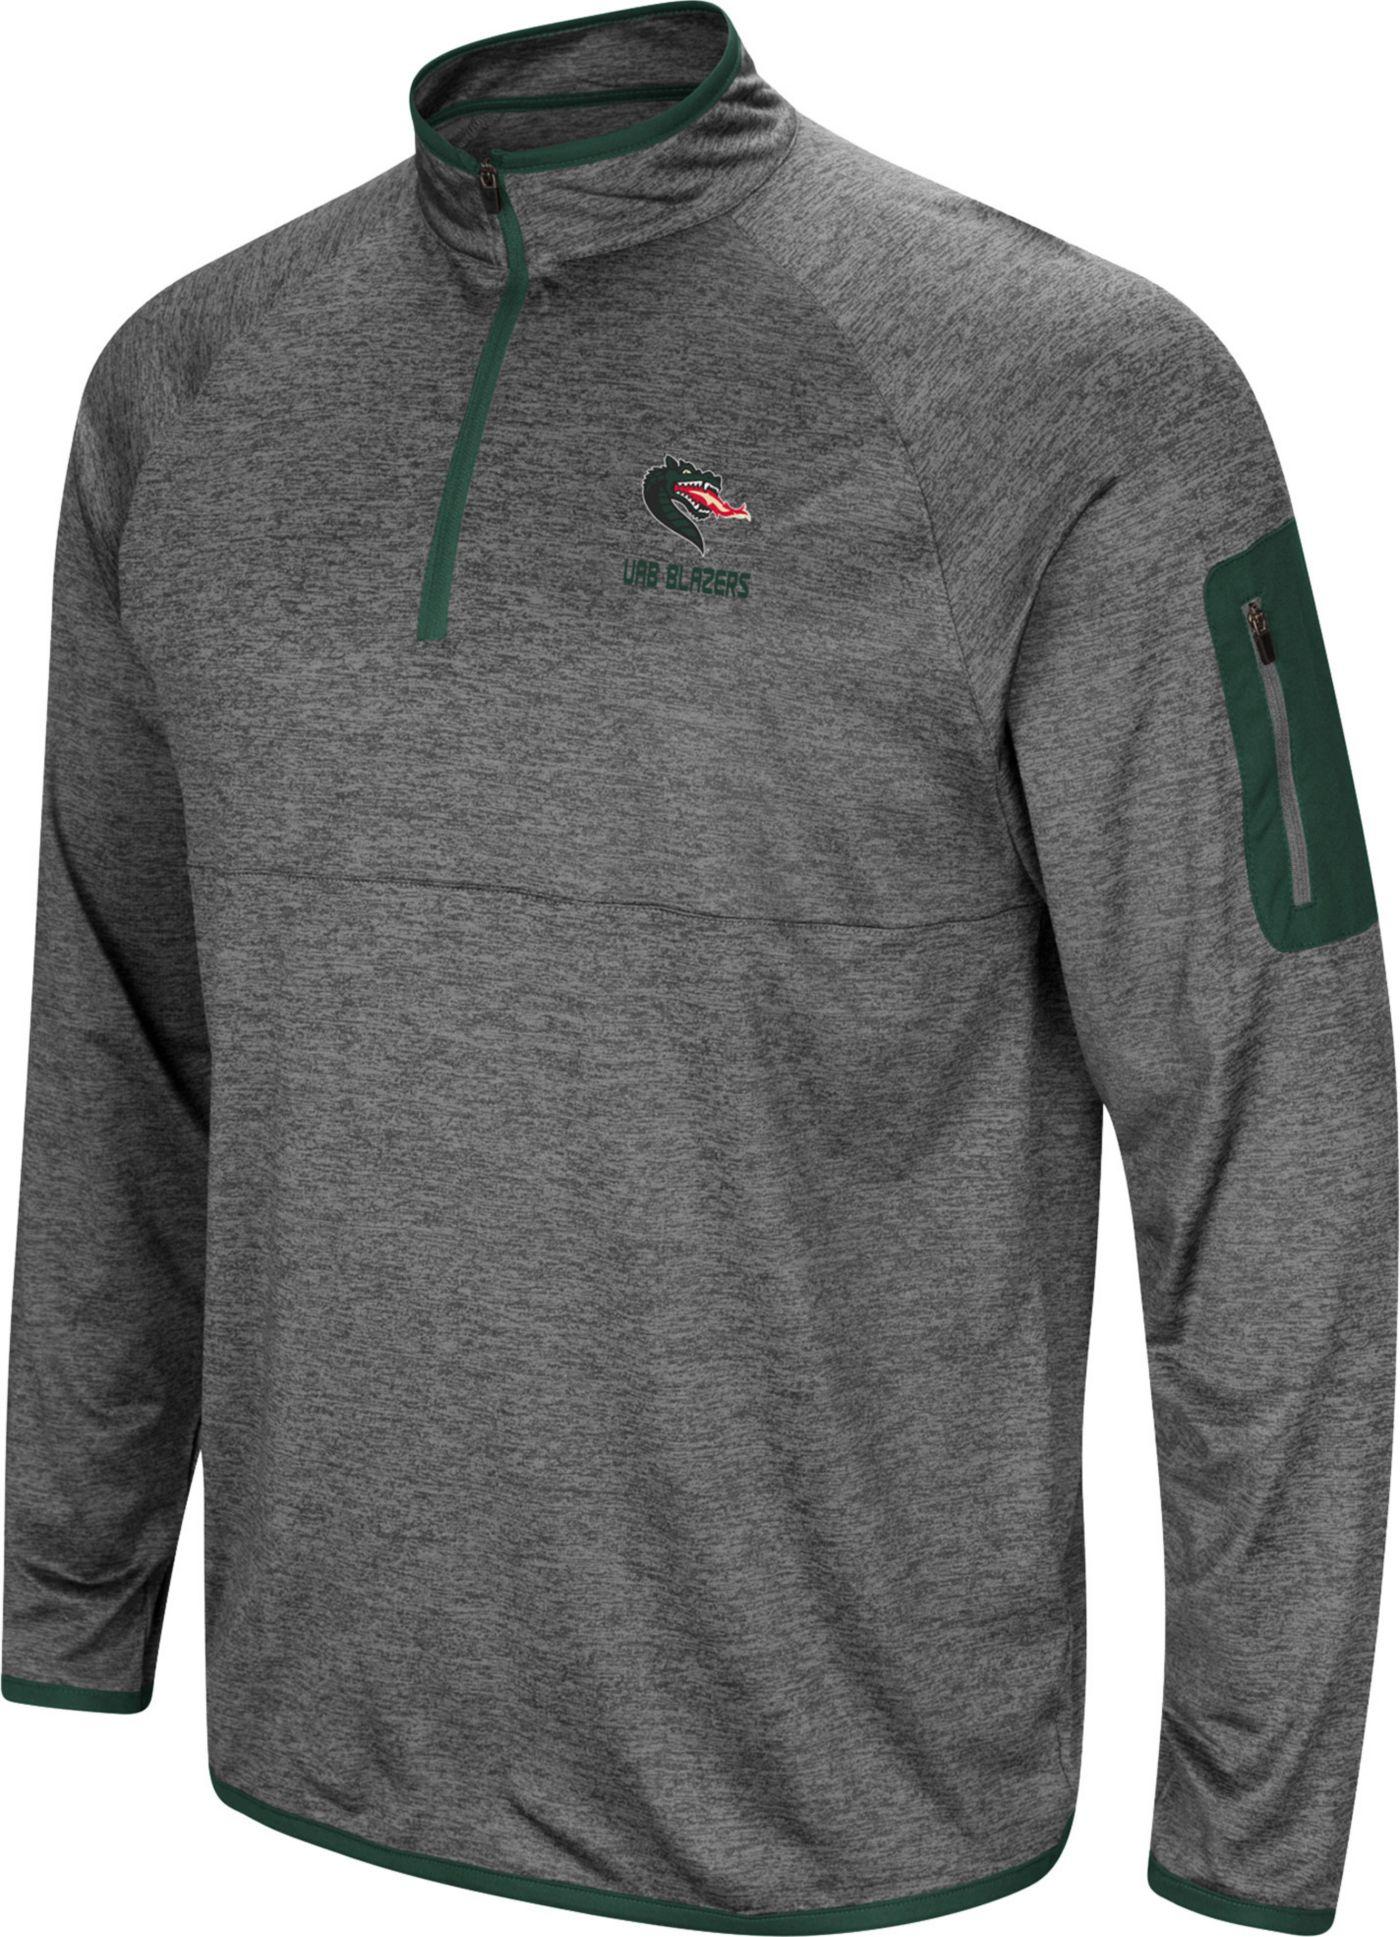 Colosseum Men's UAB Blazers Grey Indus River Quarter-Zip Shirt